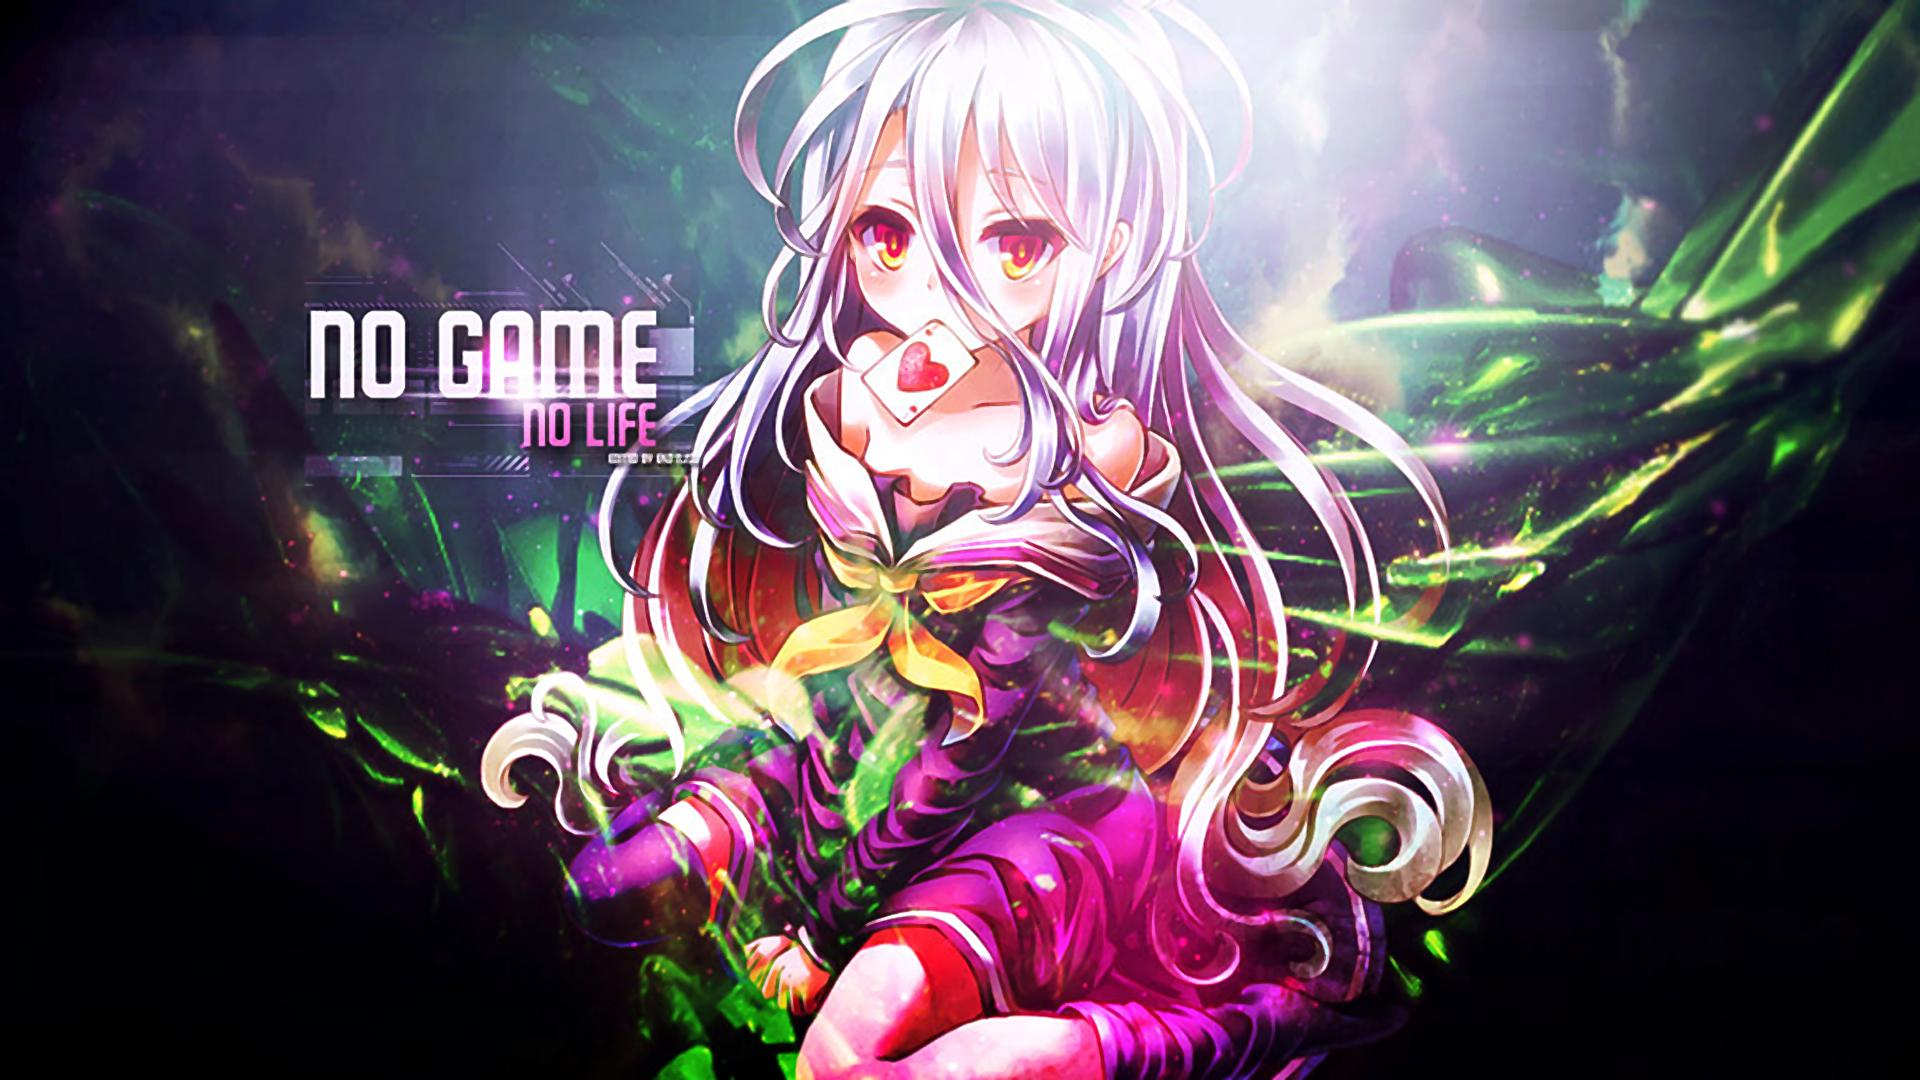 Download 99 Koleksi Wallpaper Anime Hd No Game No Life HD Terbaik